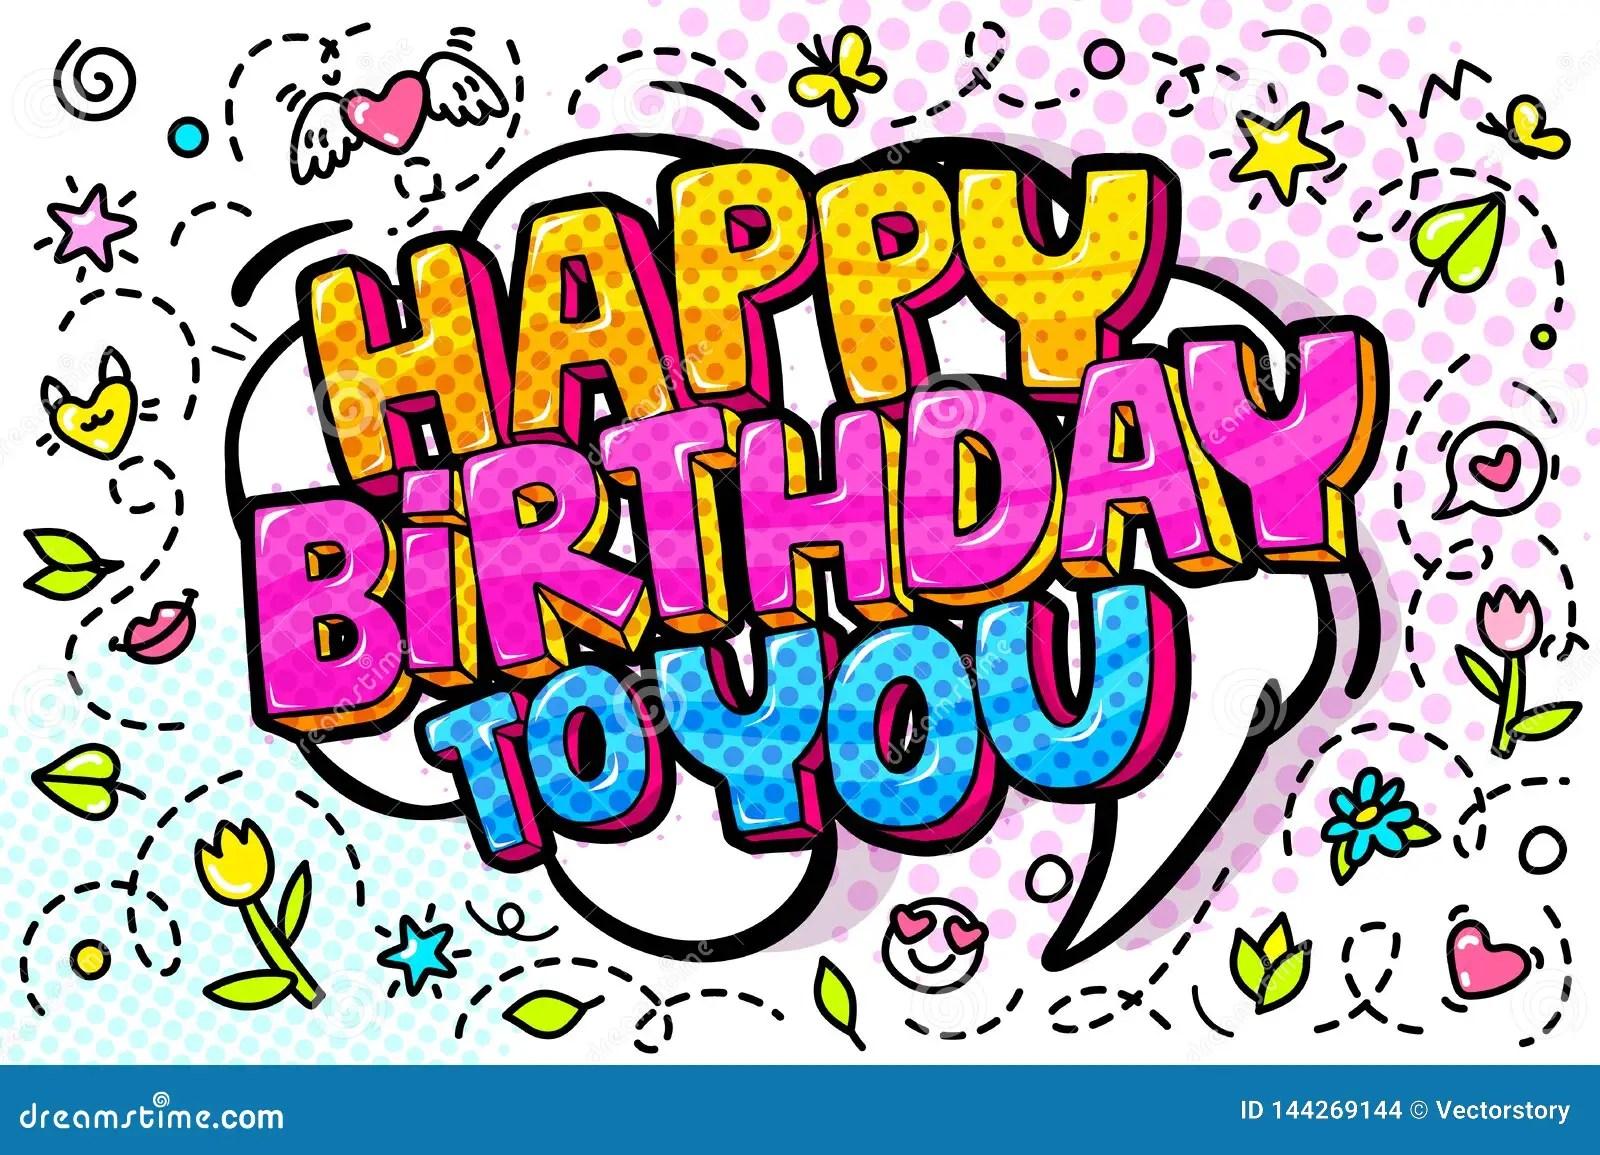 Happy Birthday Word Art Stock Illustrations 4 069 Happy Birthday Word Art Stock Illustrations Vectors Clipart Dreamstime